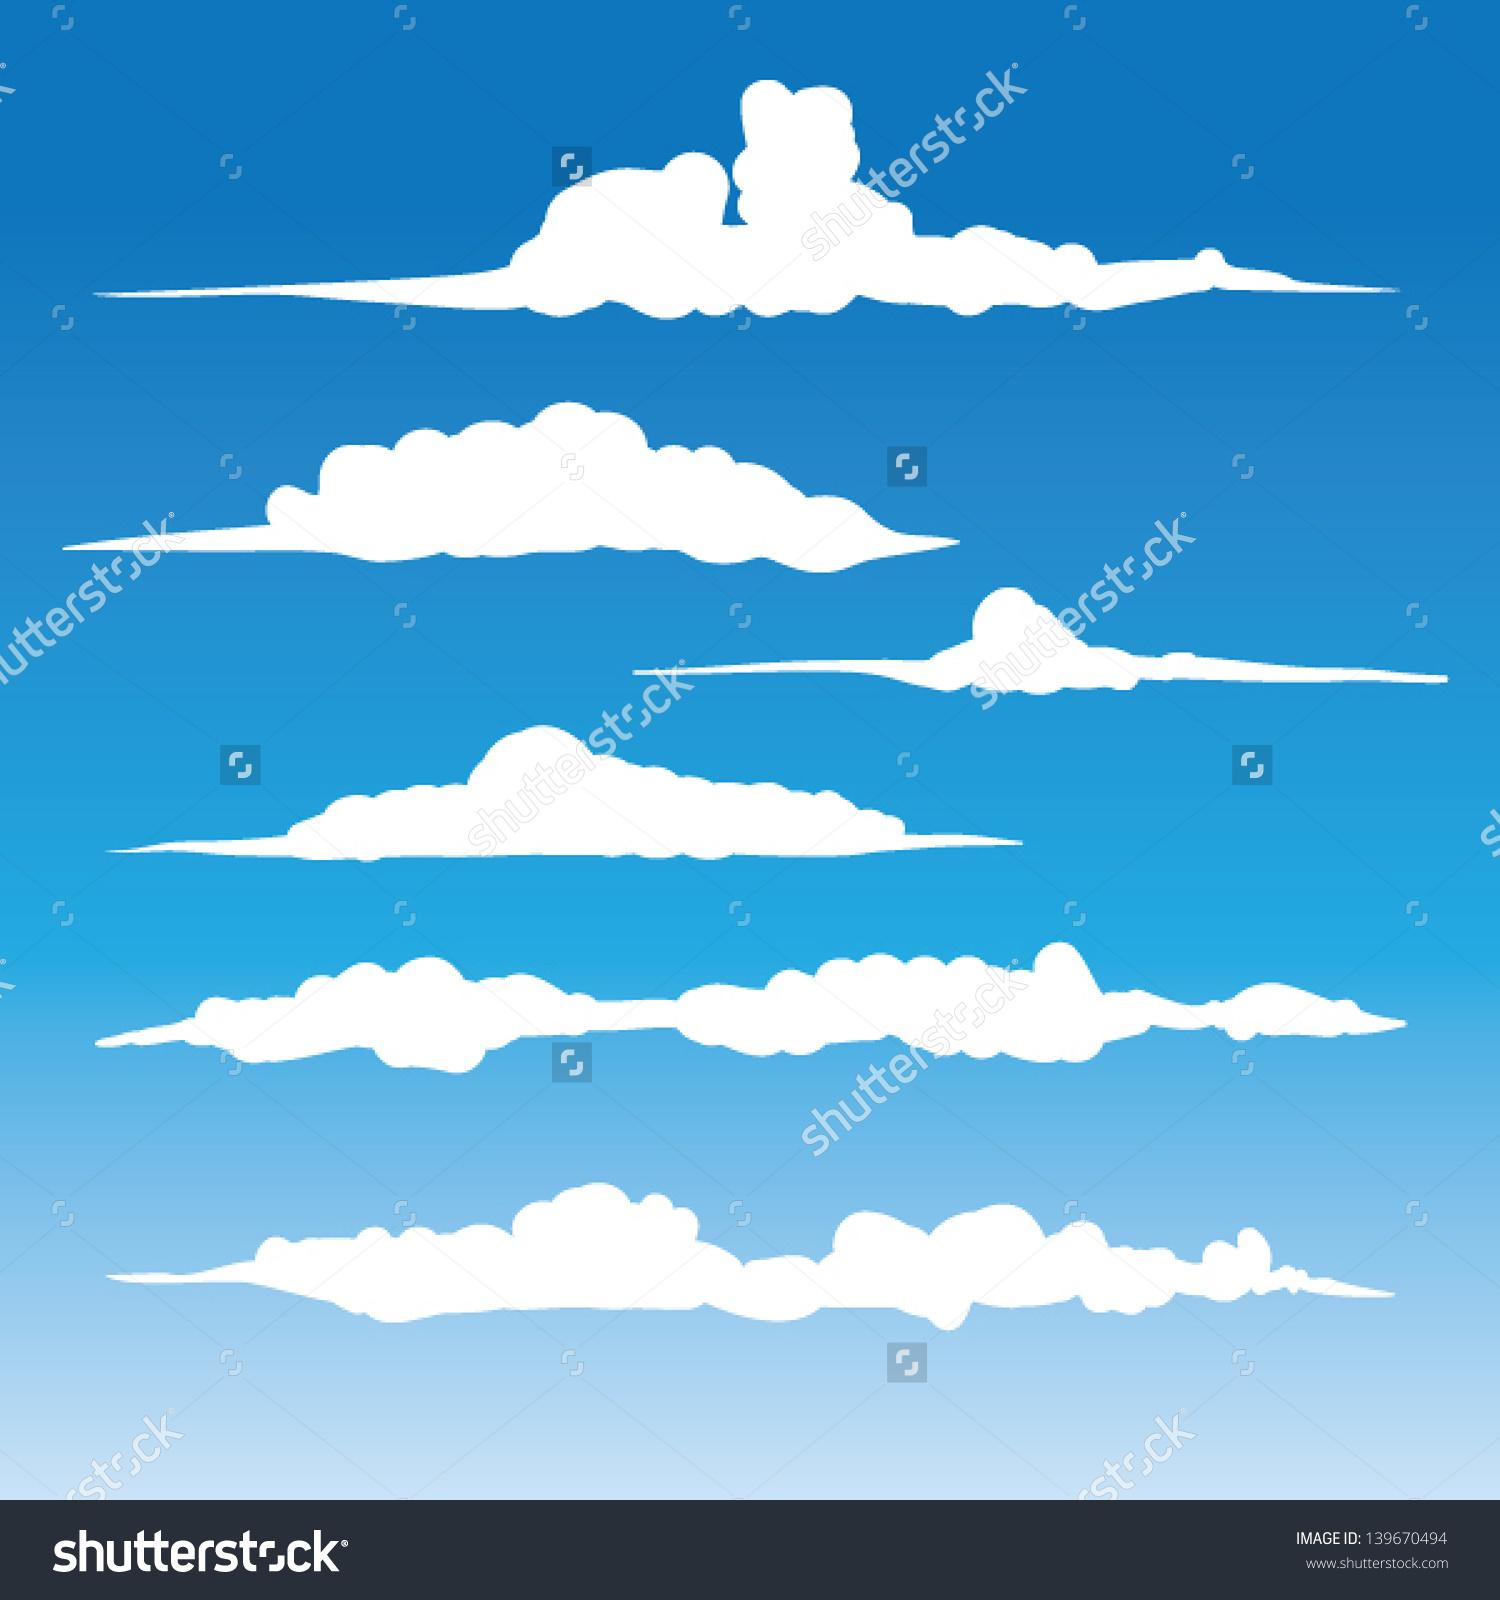 Cloud silhouette clipart.